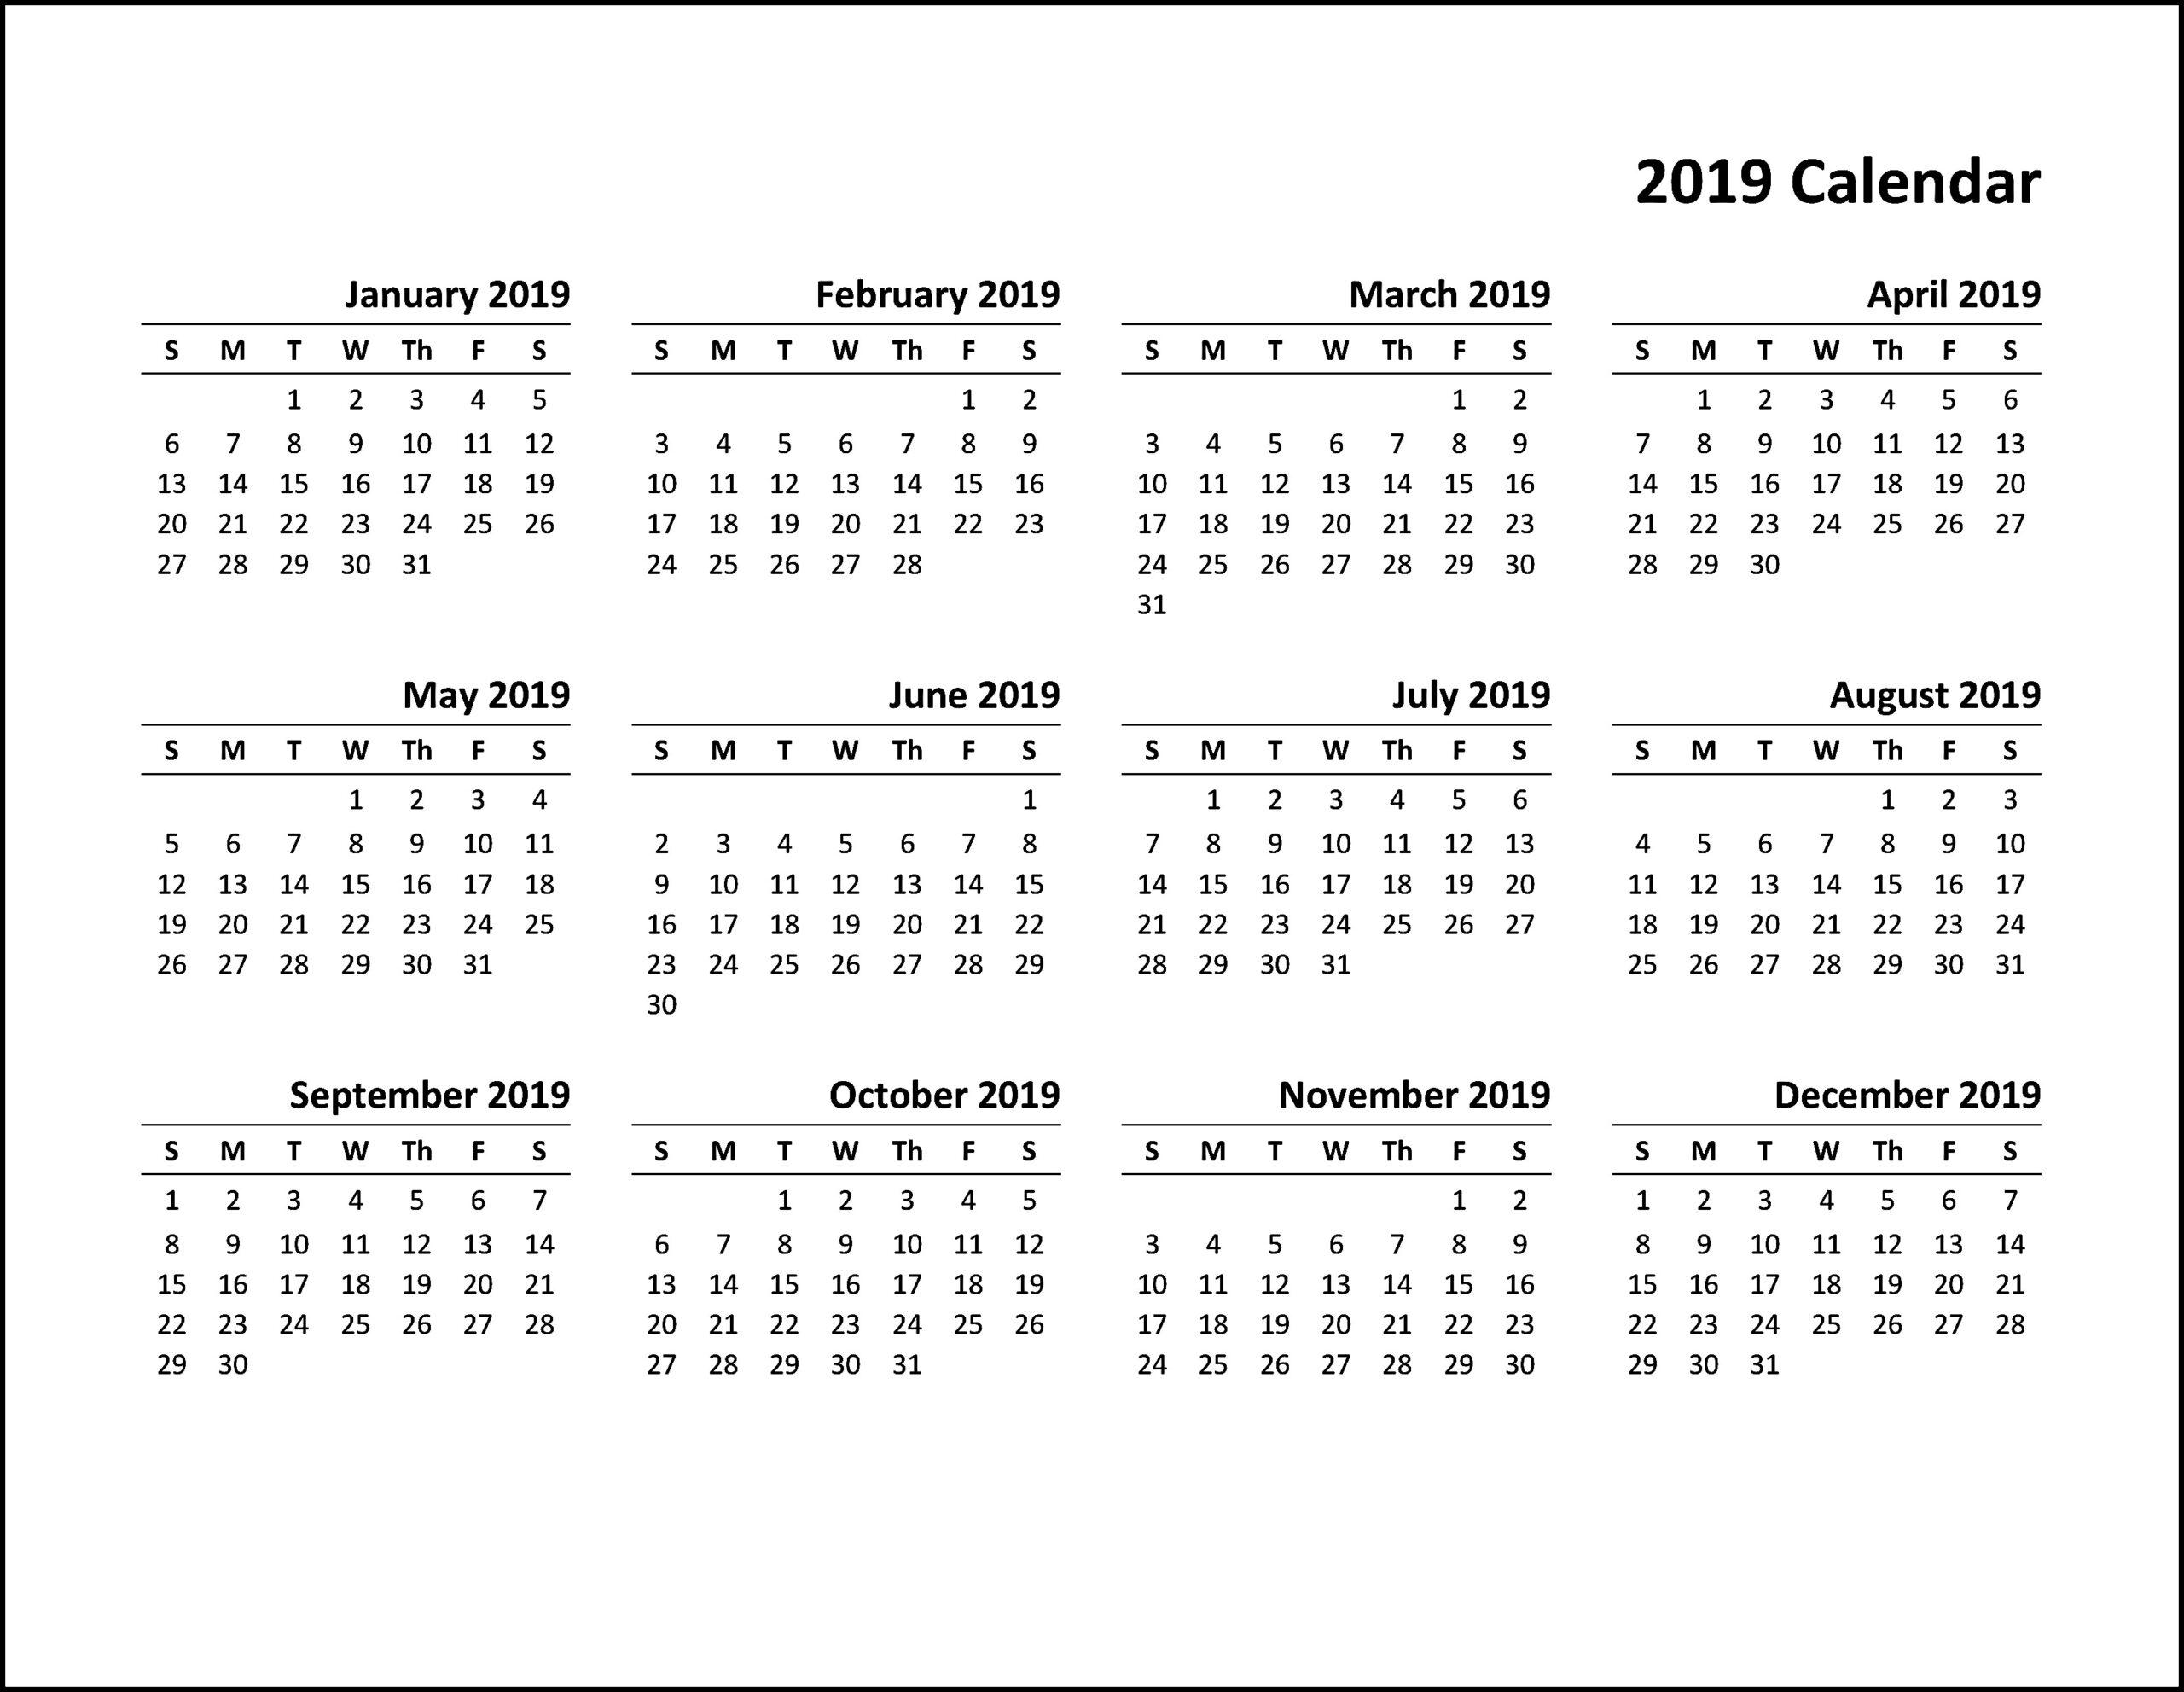 Printable Calendar 2019 Pdf, Word, Excel Template_2019 Calendar Printing Johannesburg